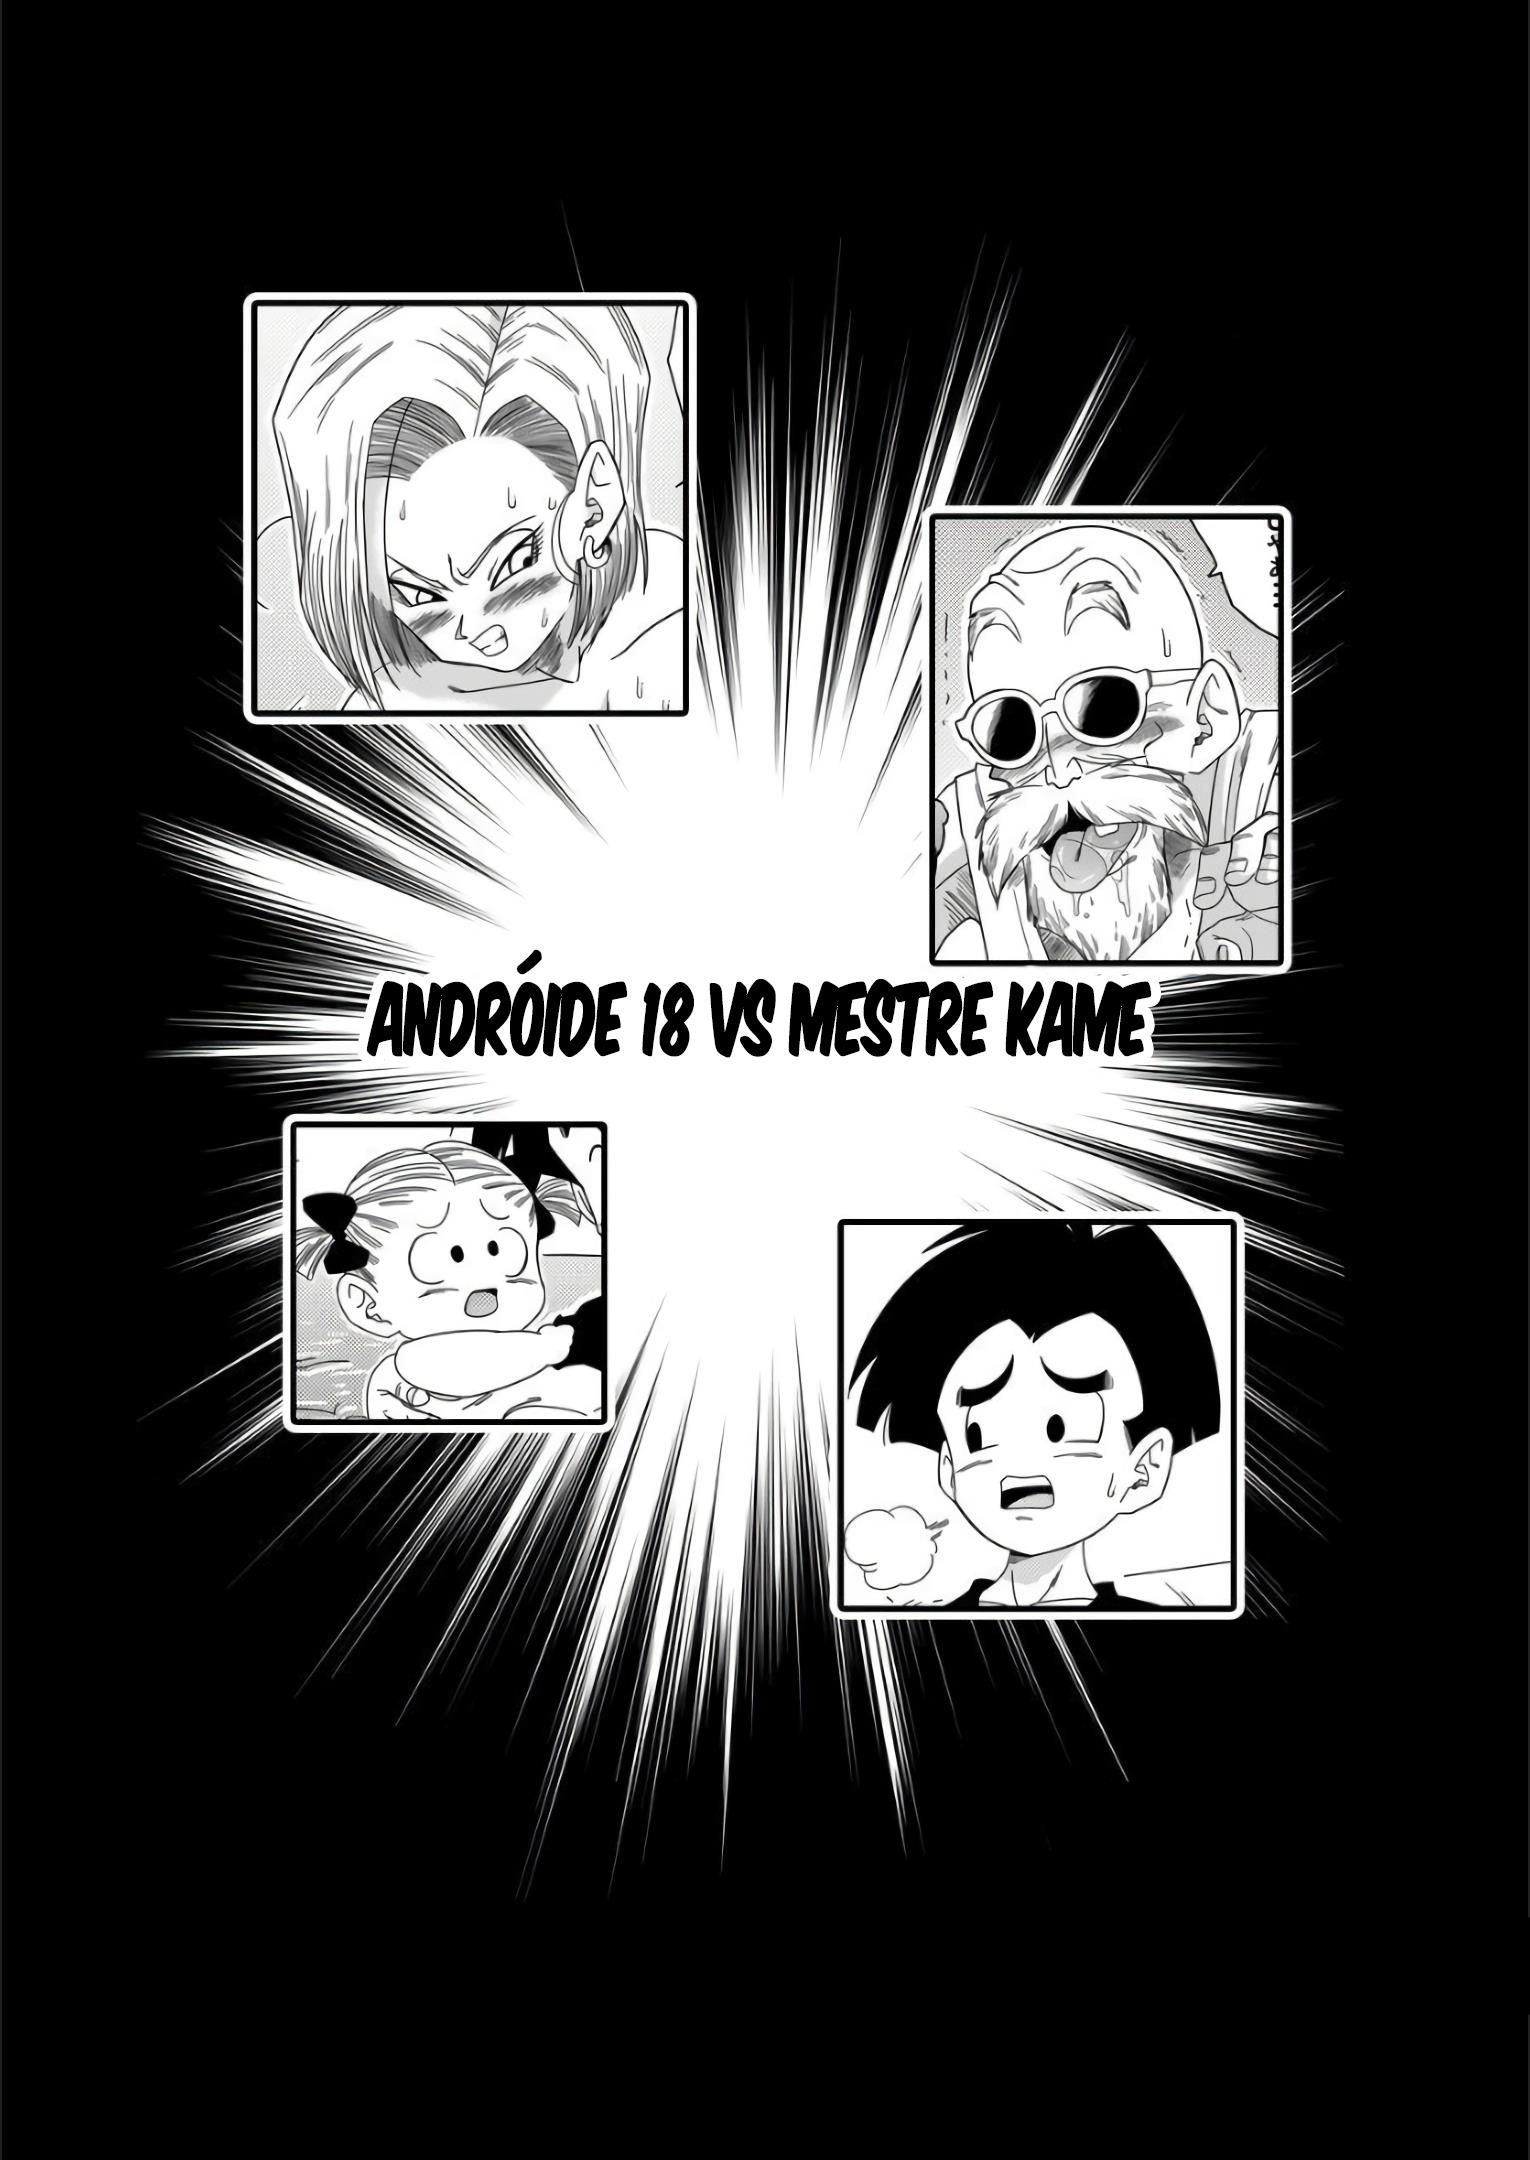 Andróide 18 VS Mestre Kame